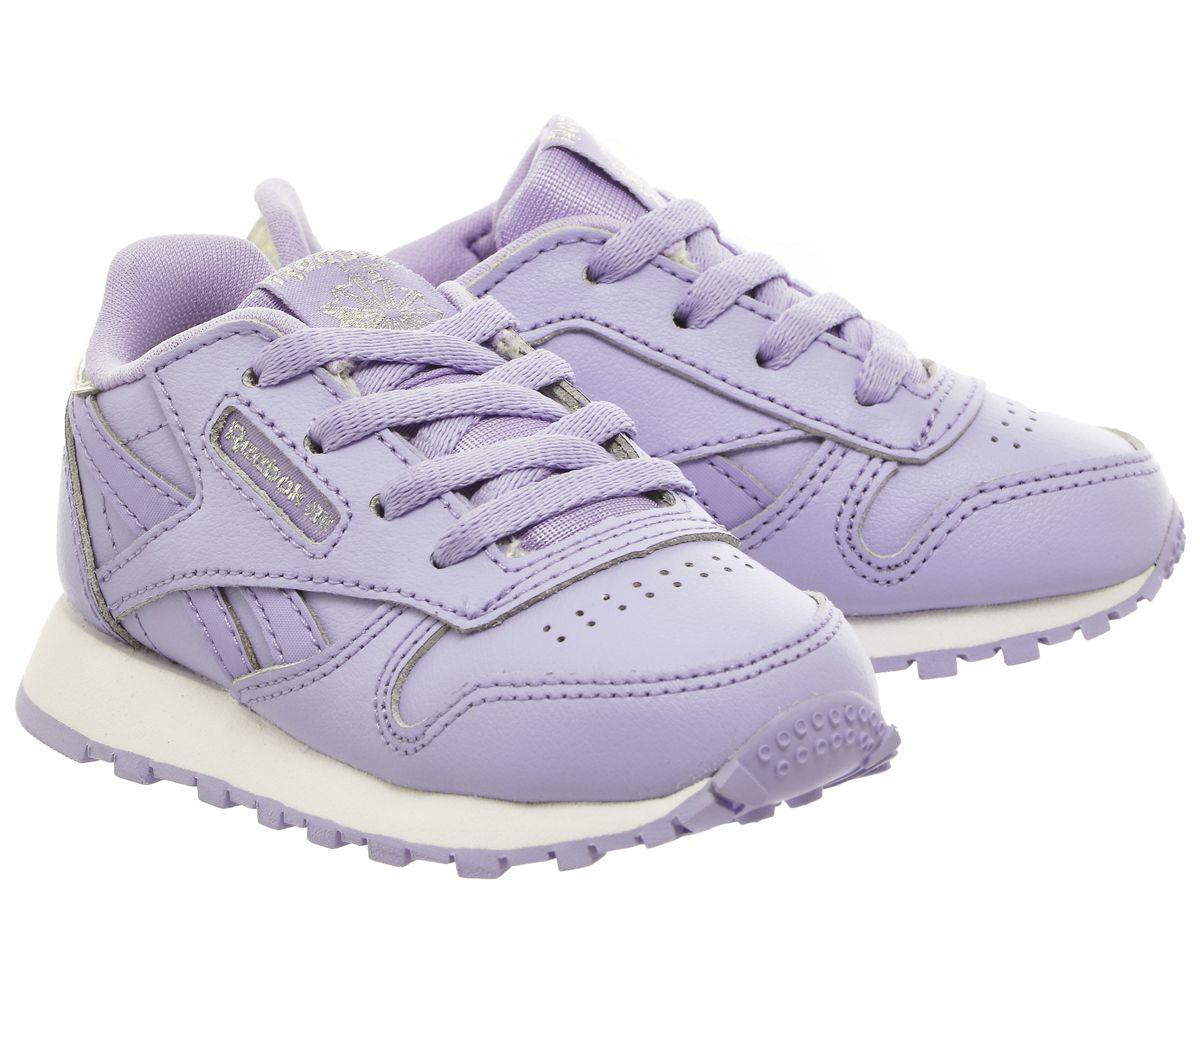 hot sale online e31c8 60d57 Details about Kids Reebok Classic Leather Td Pastel Lilac Glow Kids